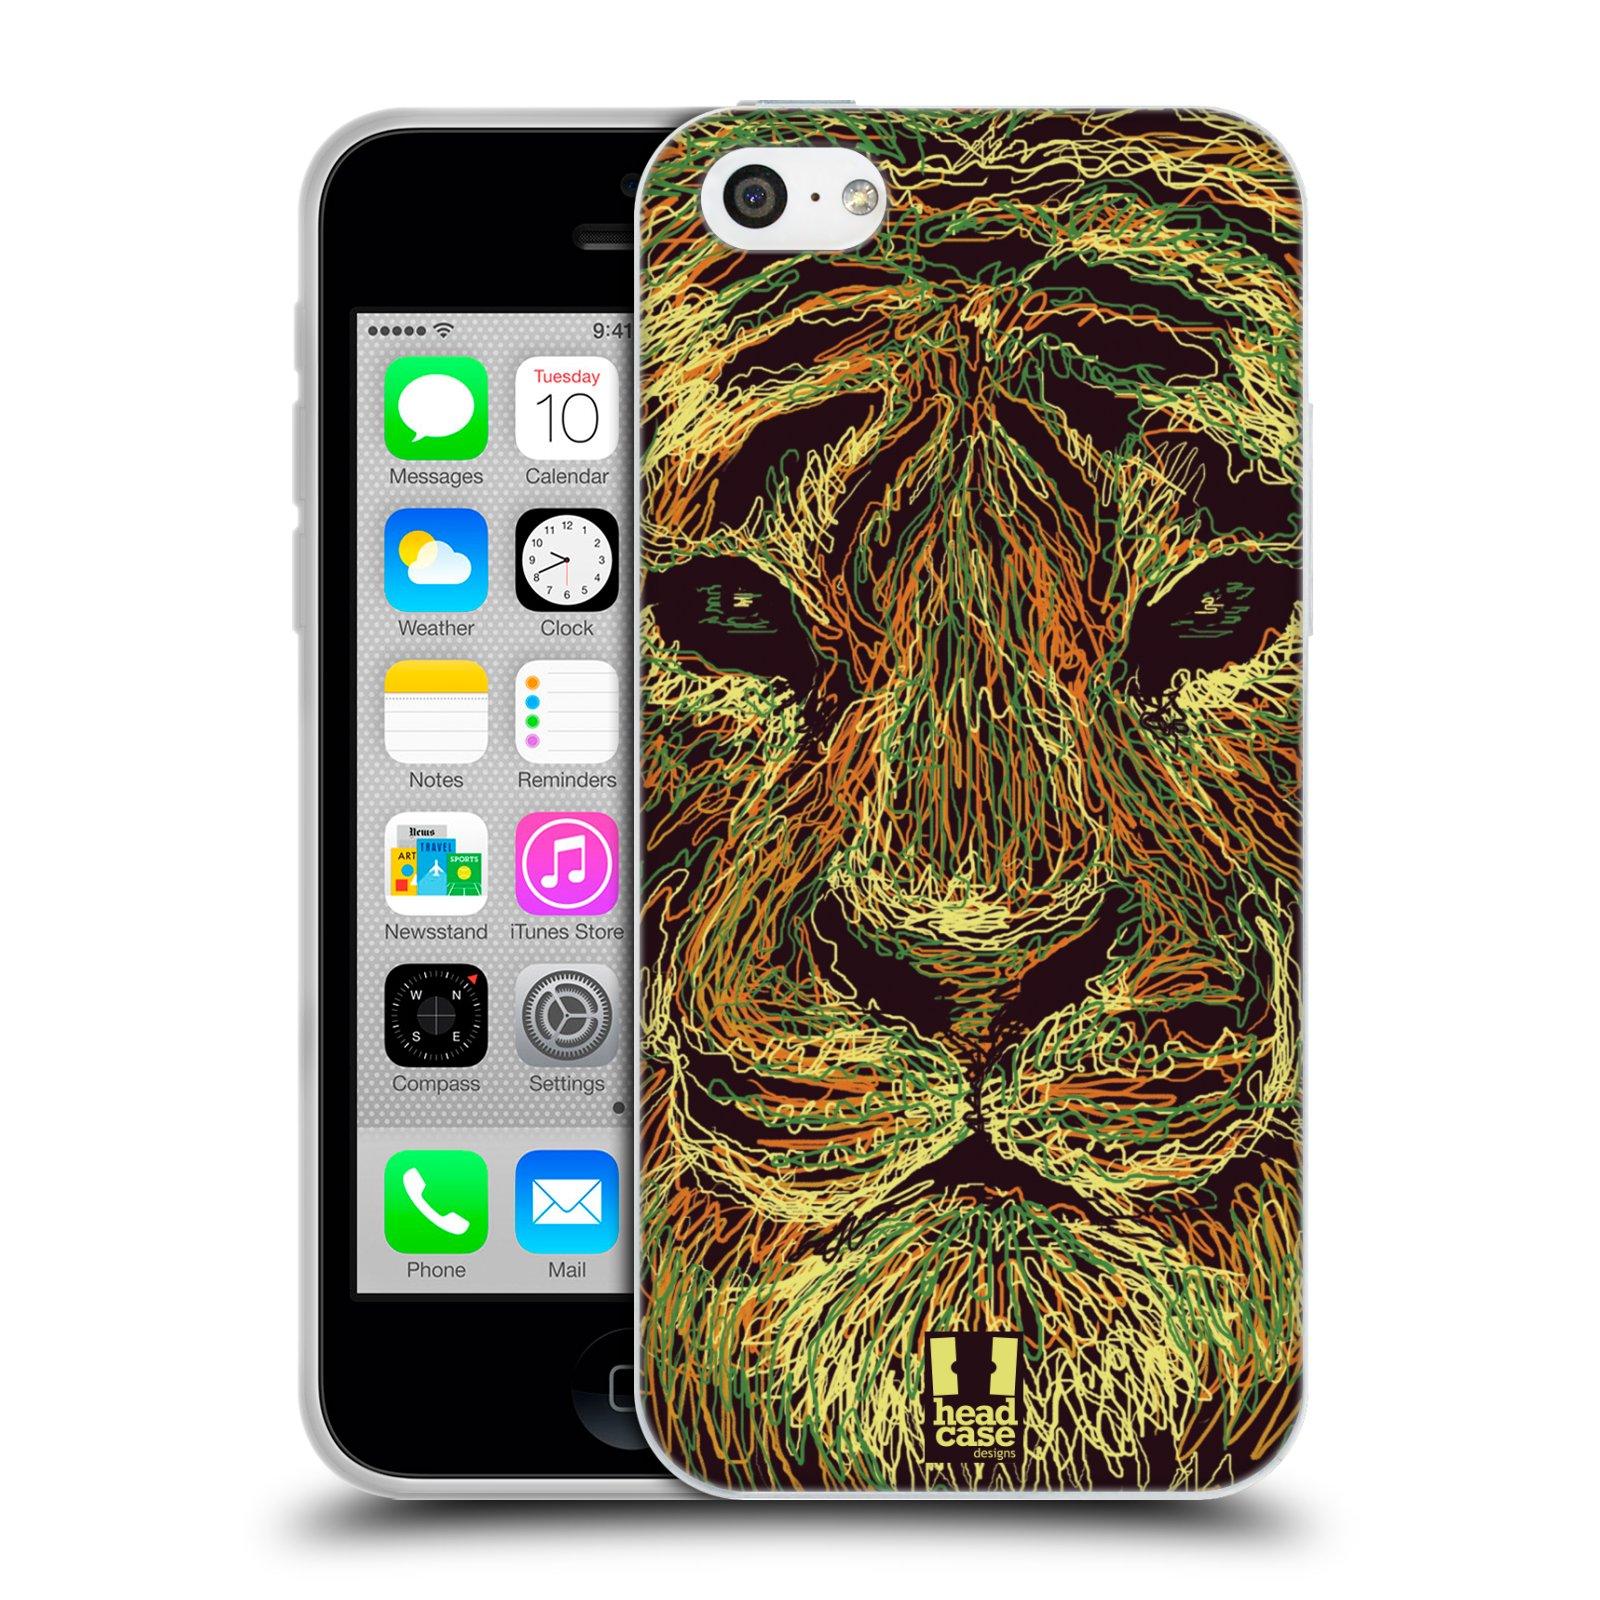 HEAD CASE silikonový obal na mobil Apple Iphone 5C vzor zvíře čmáranice tygr